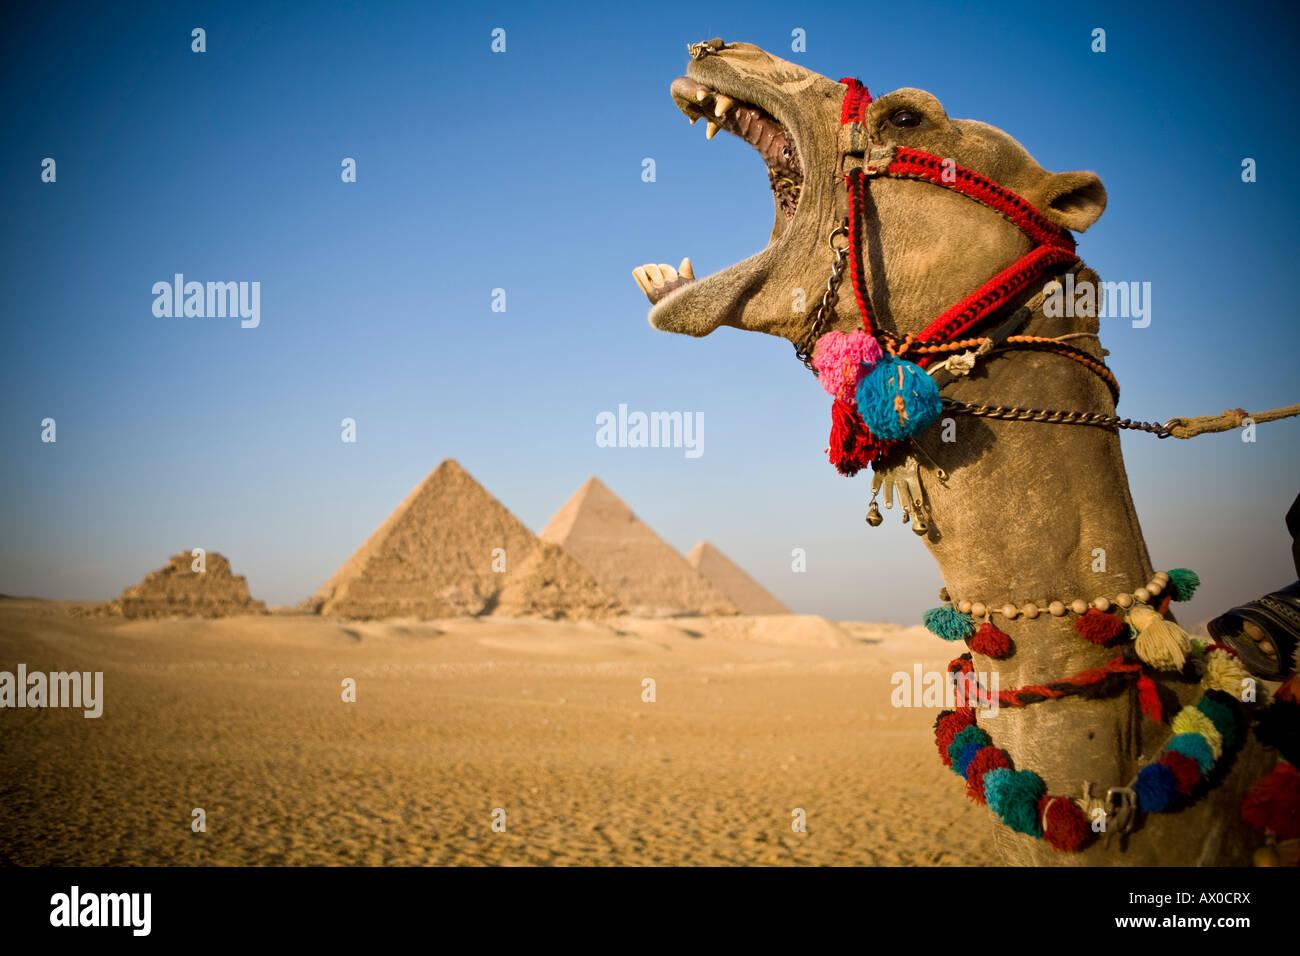 Kamele bei den Pyramiden, Gizeh, Kairo, Ägypten Stockbild